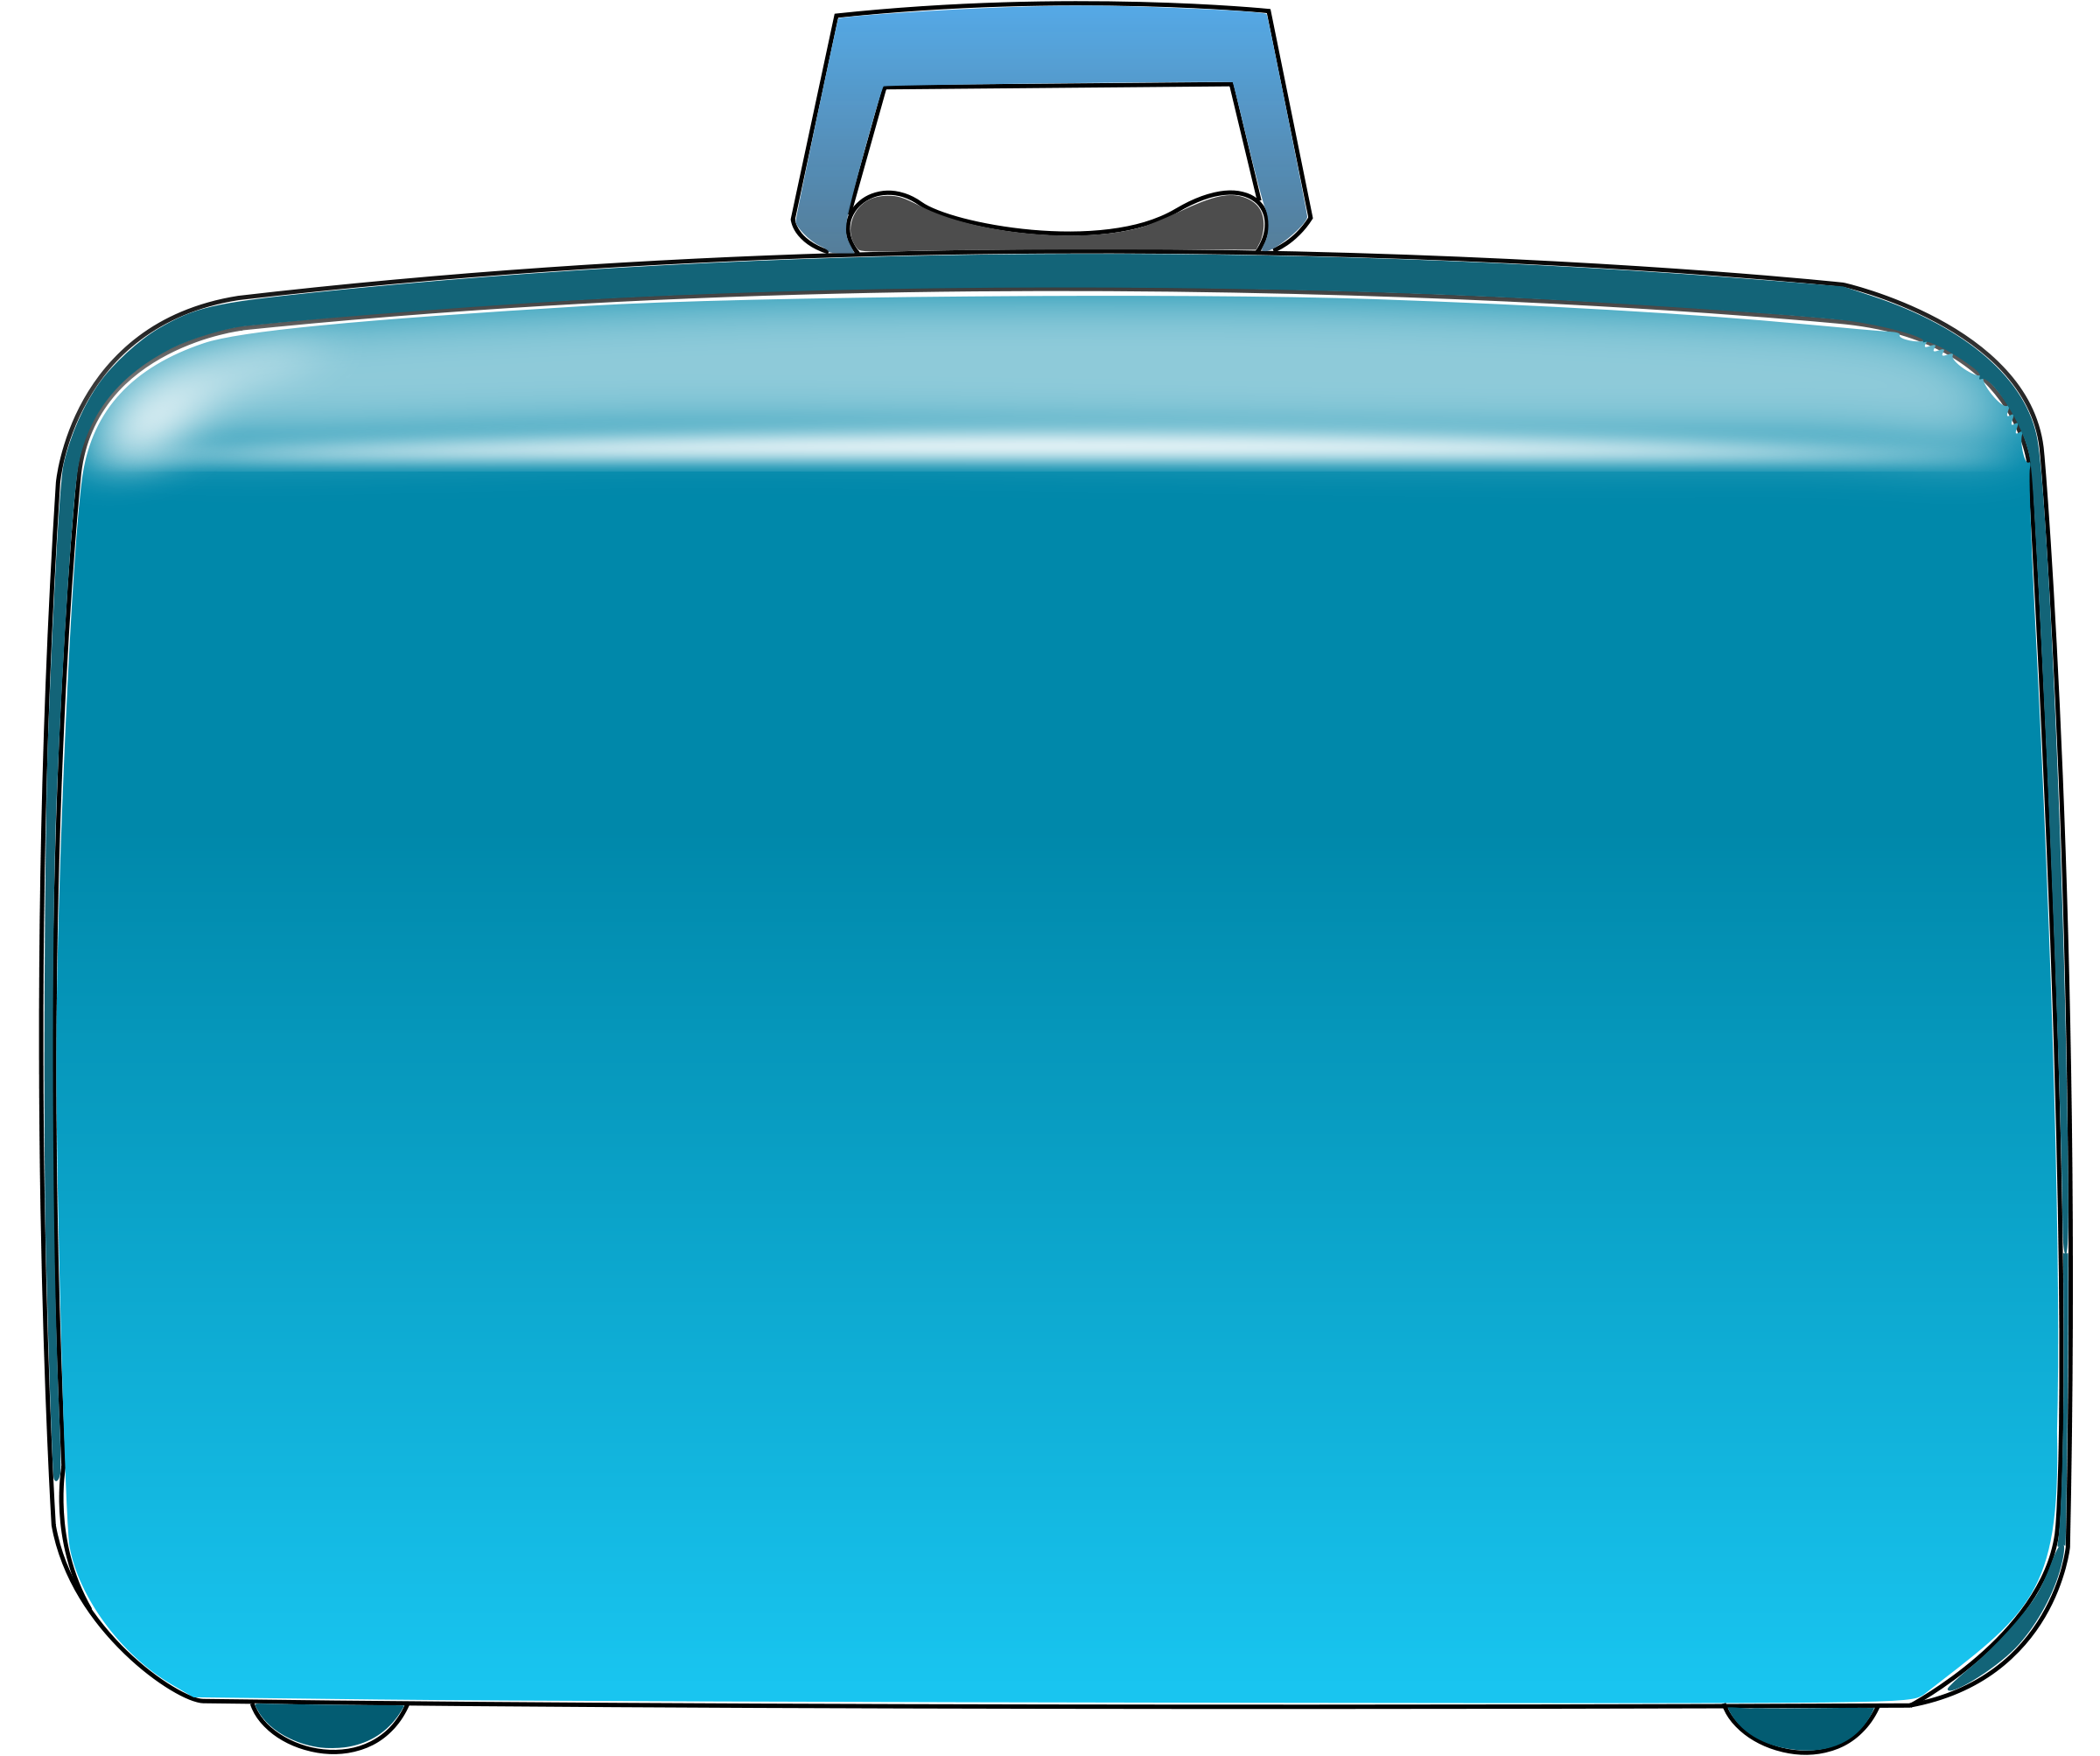 clip art suitcase. Black Bedroom Furniture Sets. Home Design Ideas